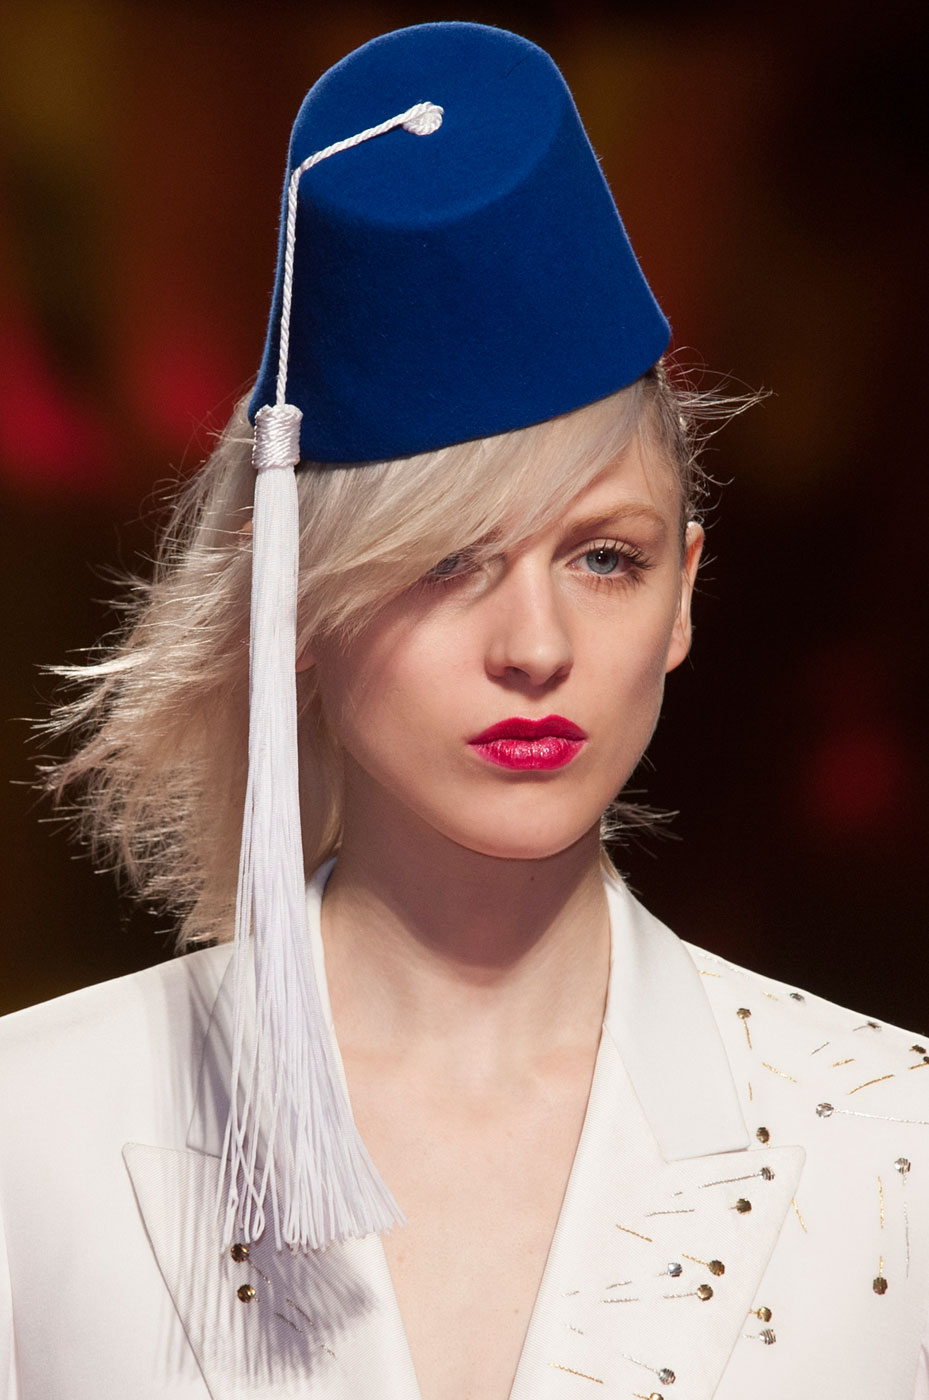 Schiaparelli-fashion-runway-show-close-ups-haute-couture-paris-spring-summer-2015-the-impression-01